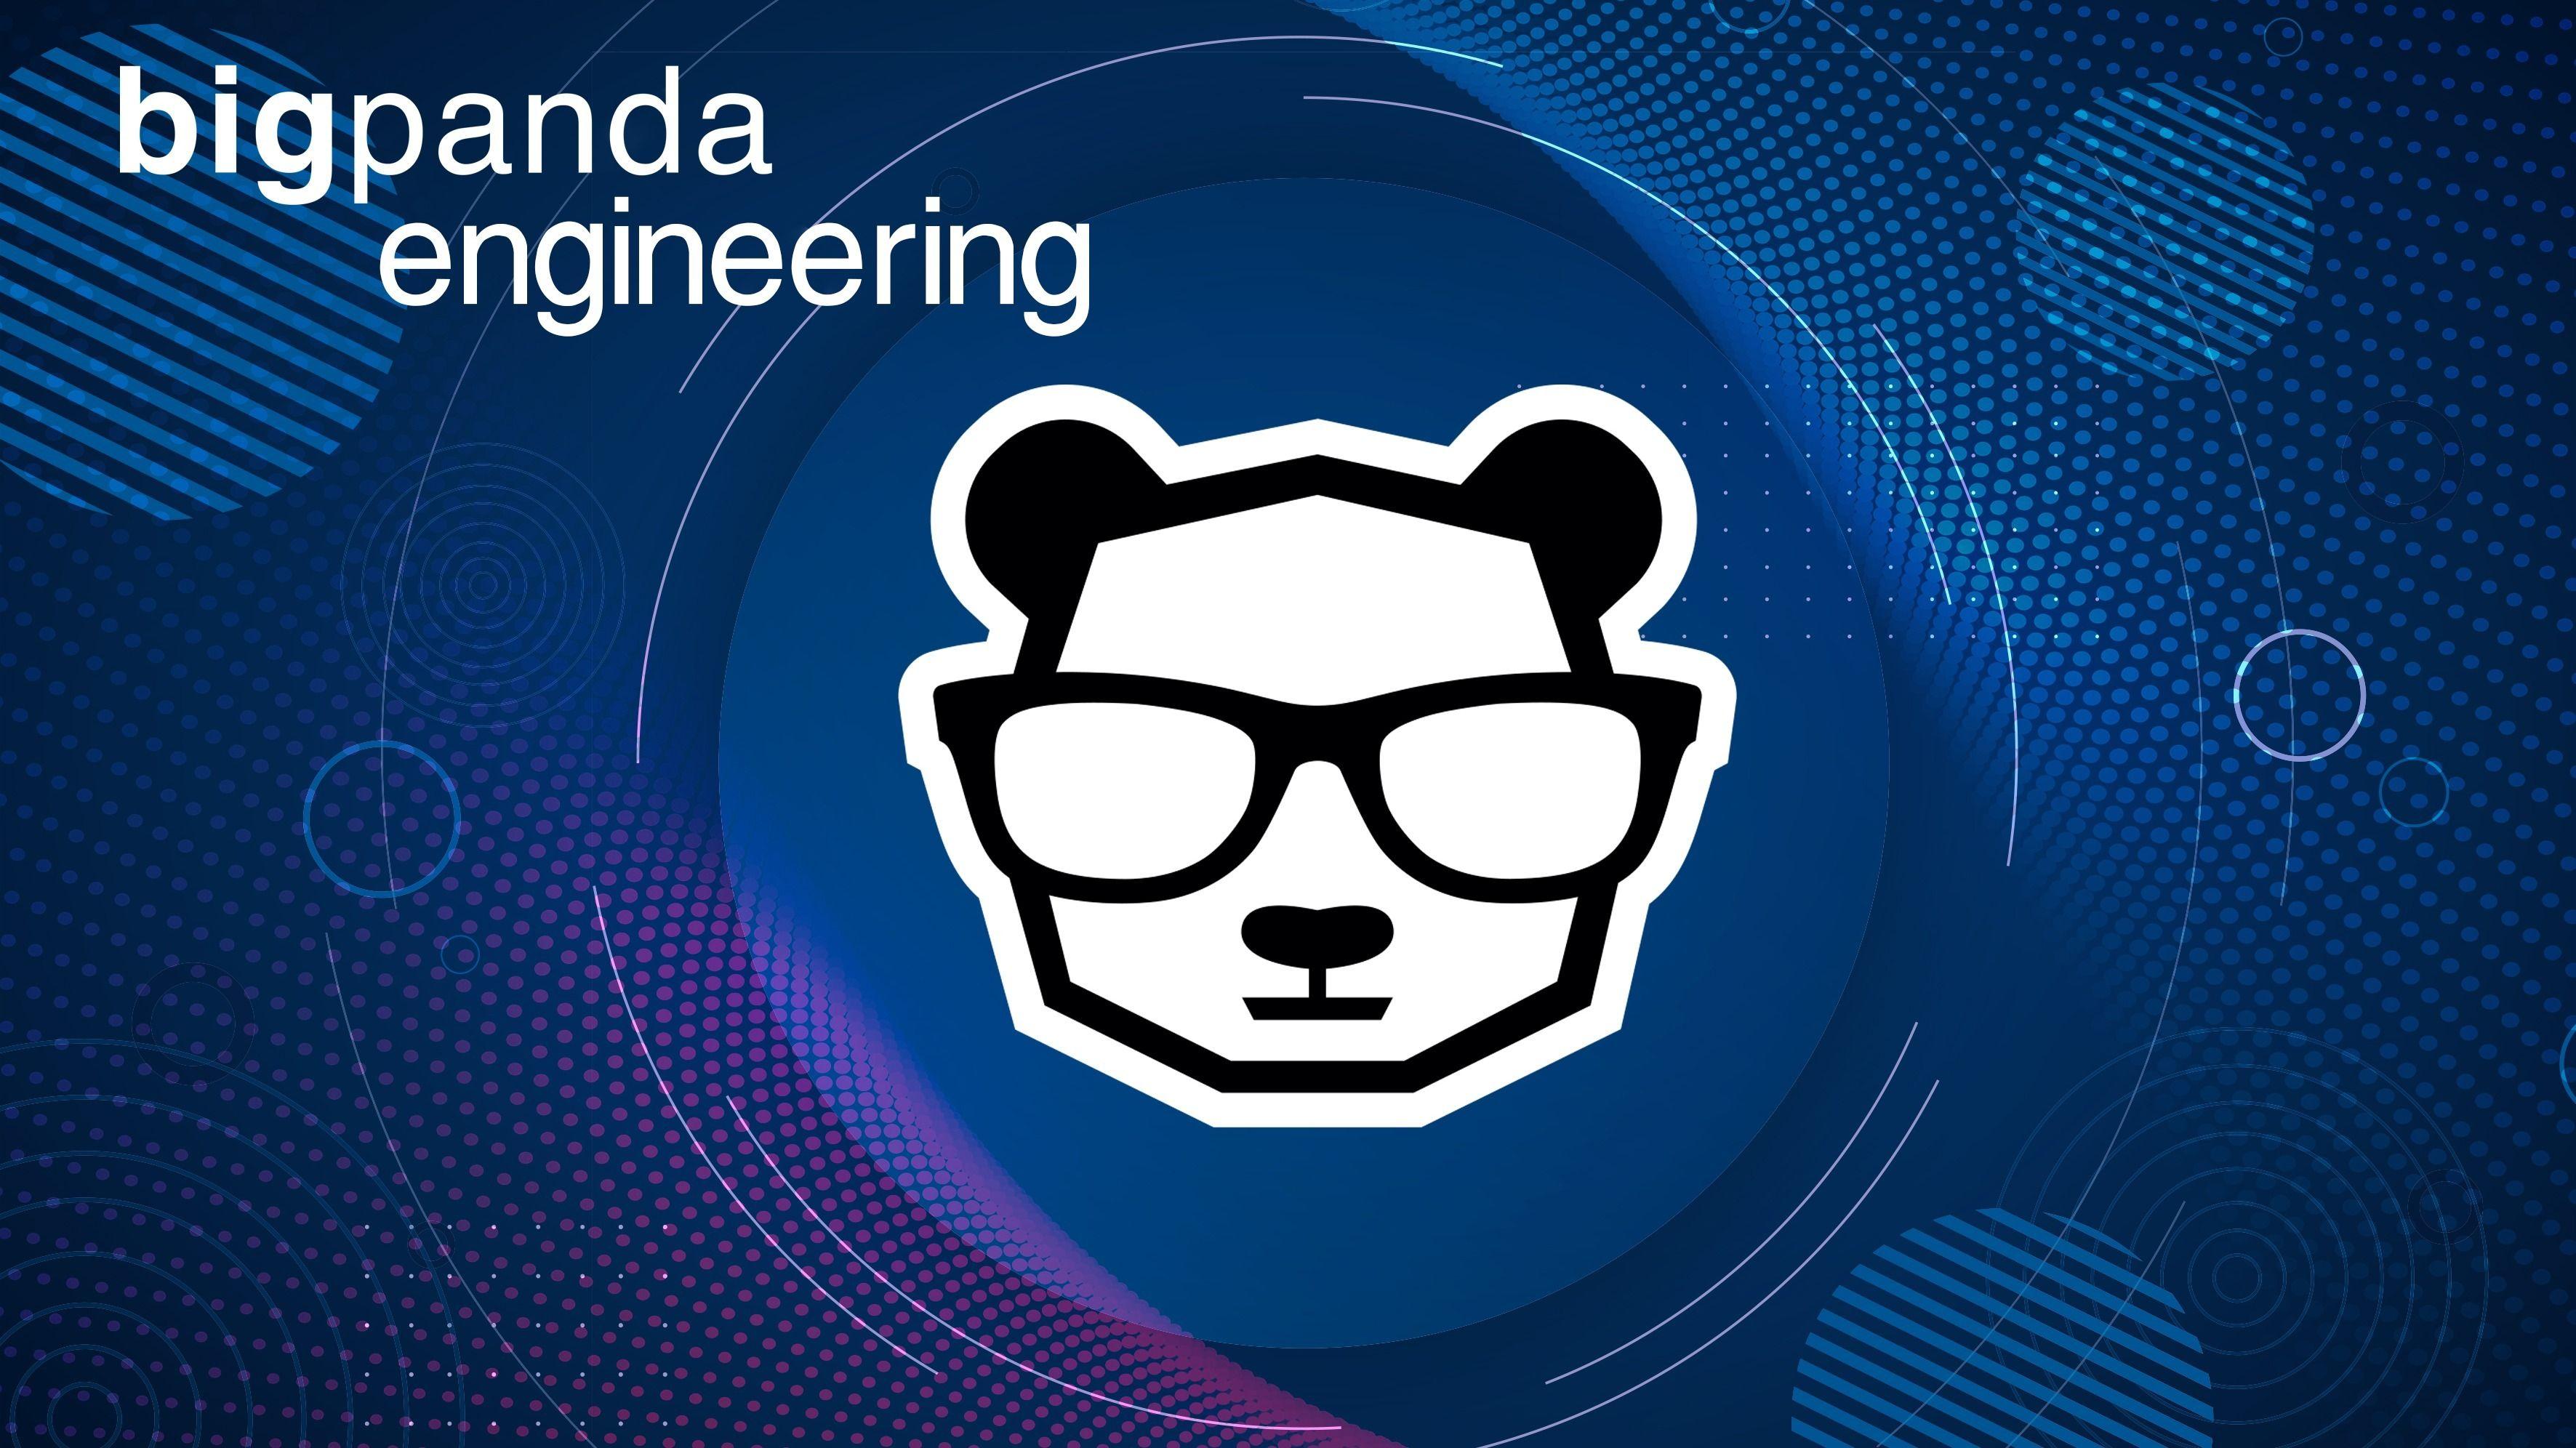 BigPanda Engineering